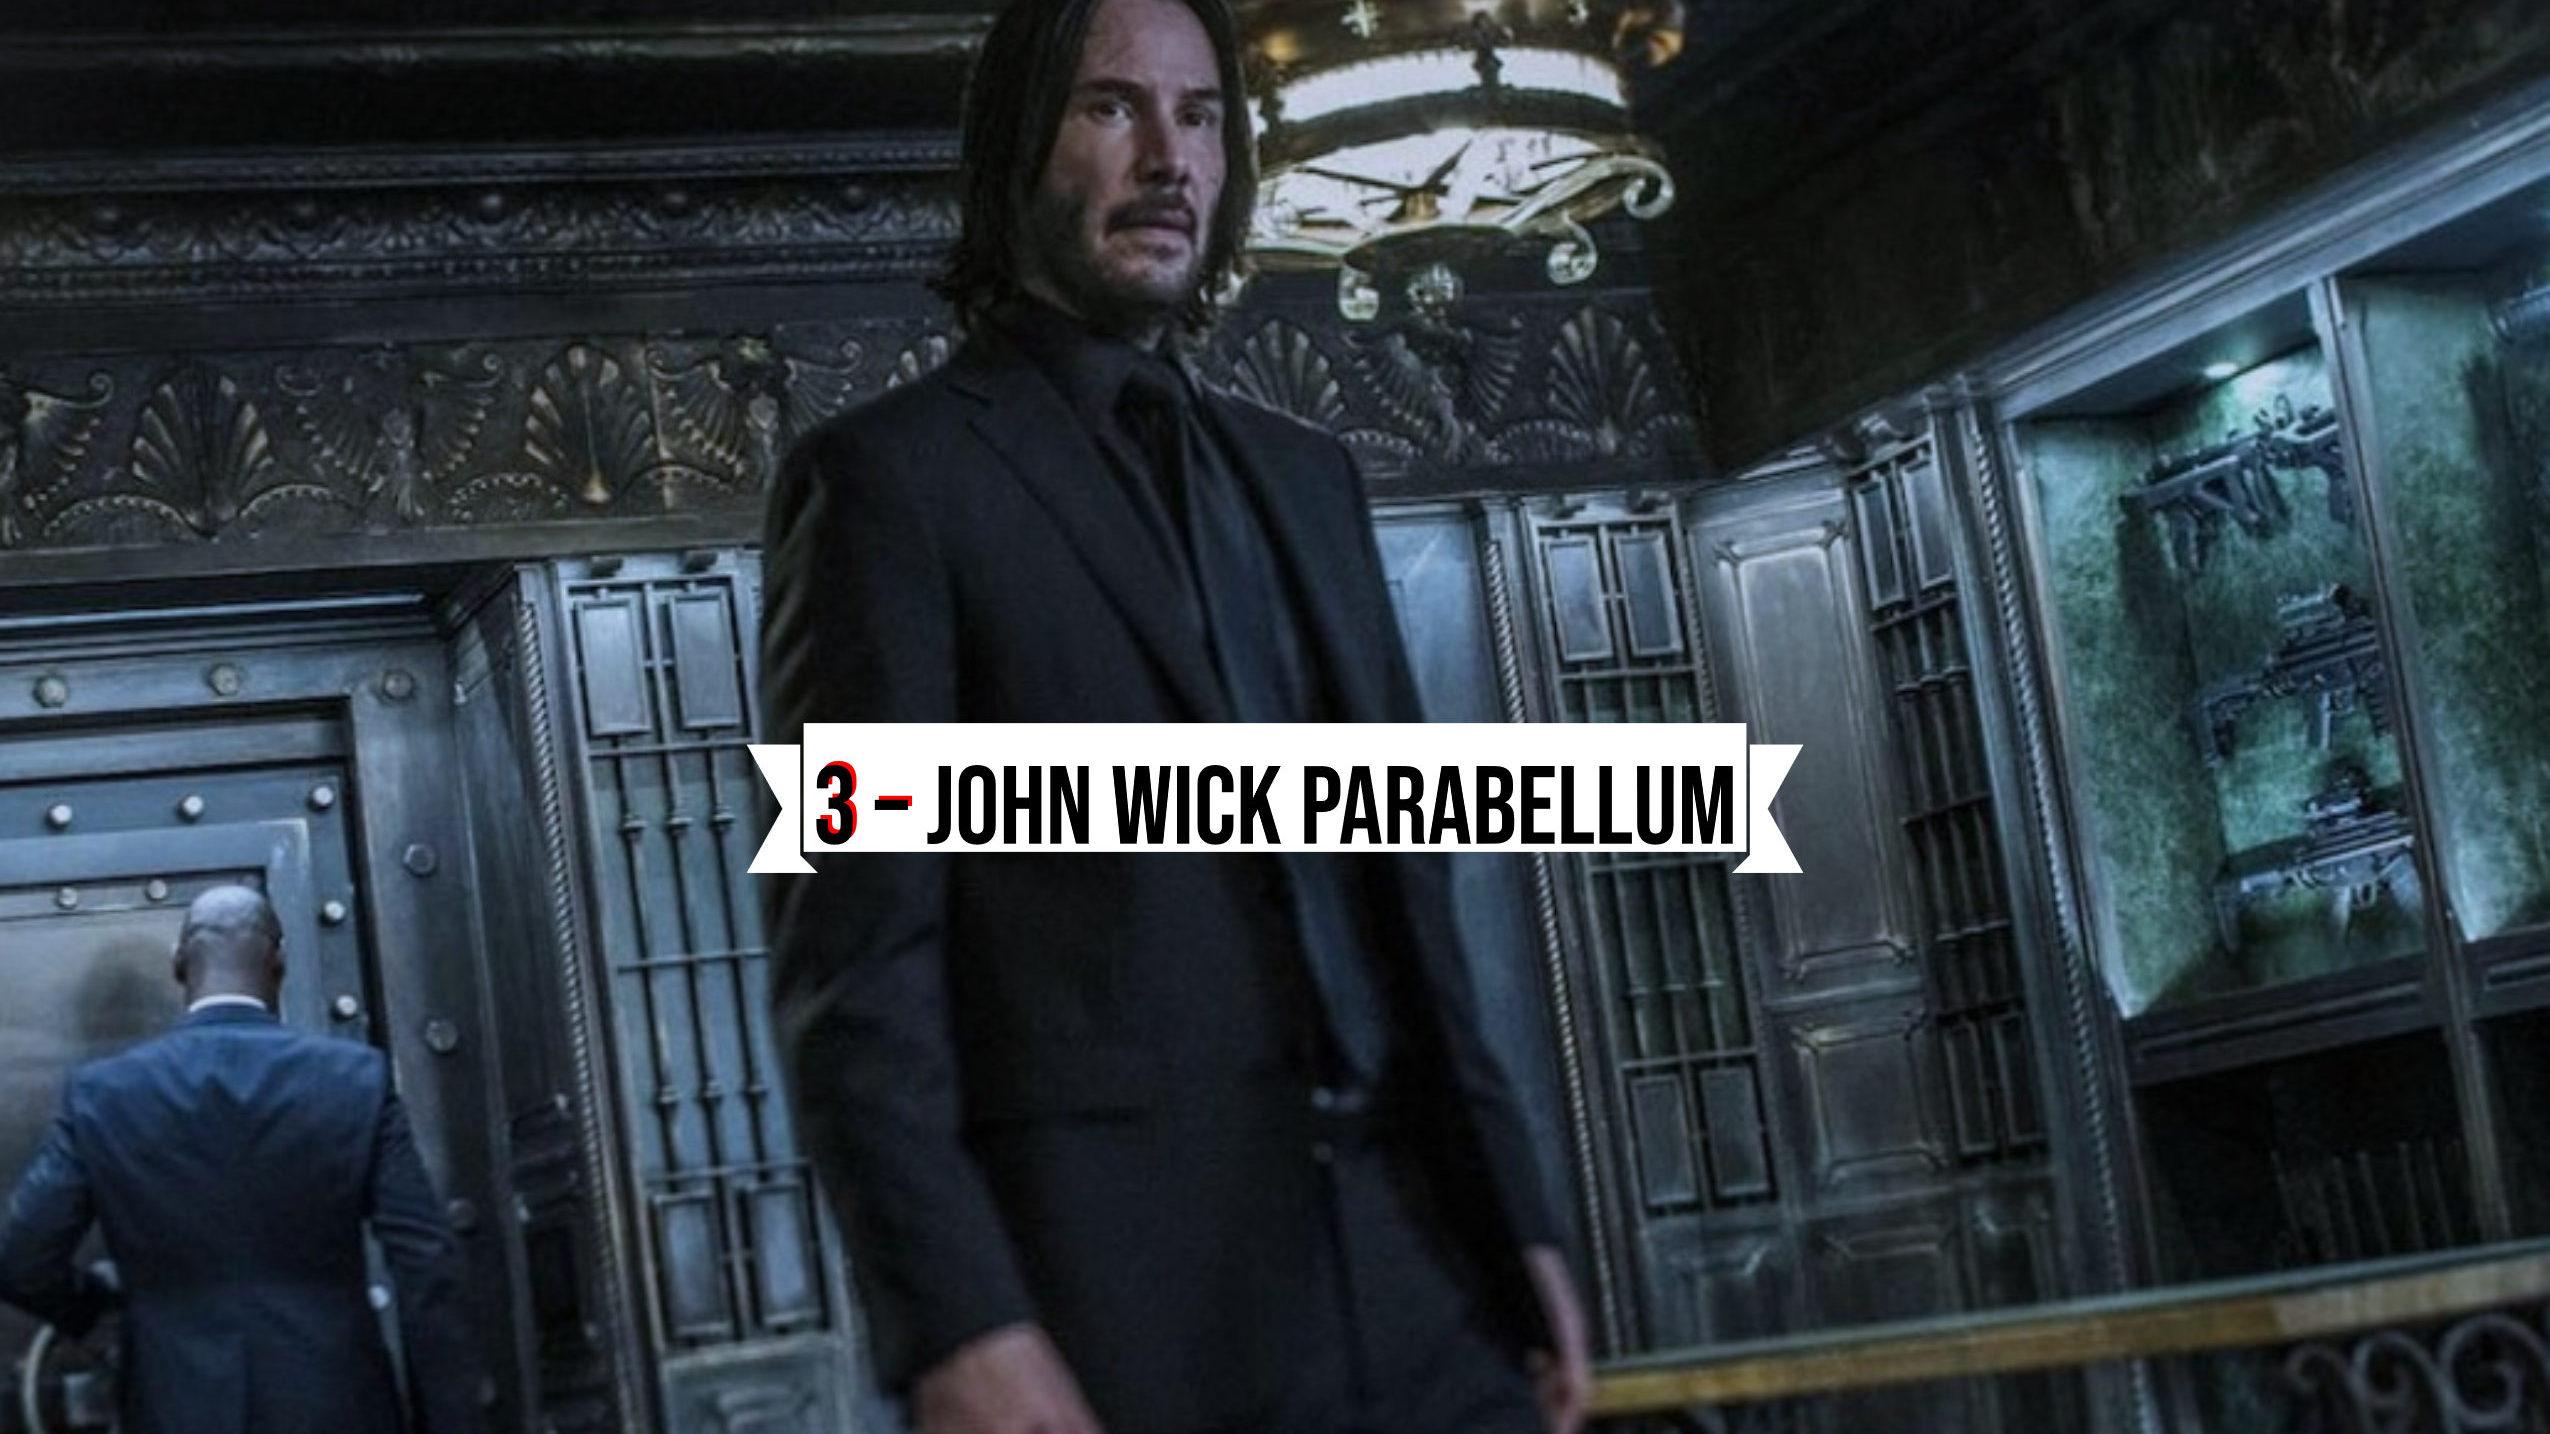 3 – John Wick Parabellum